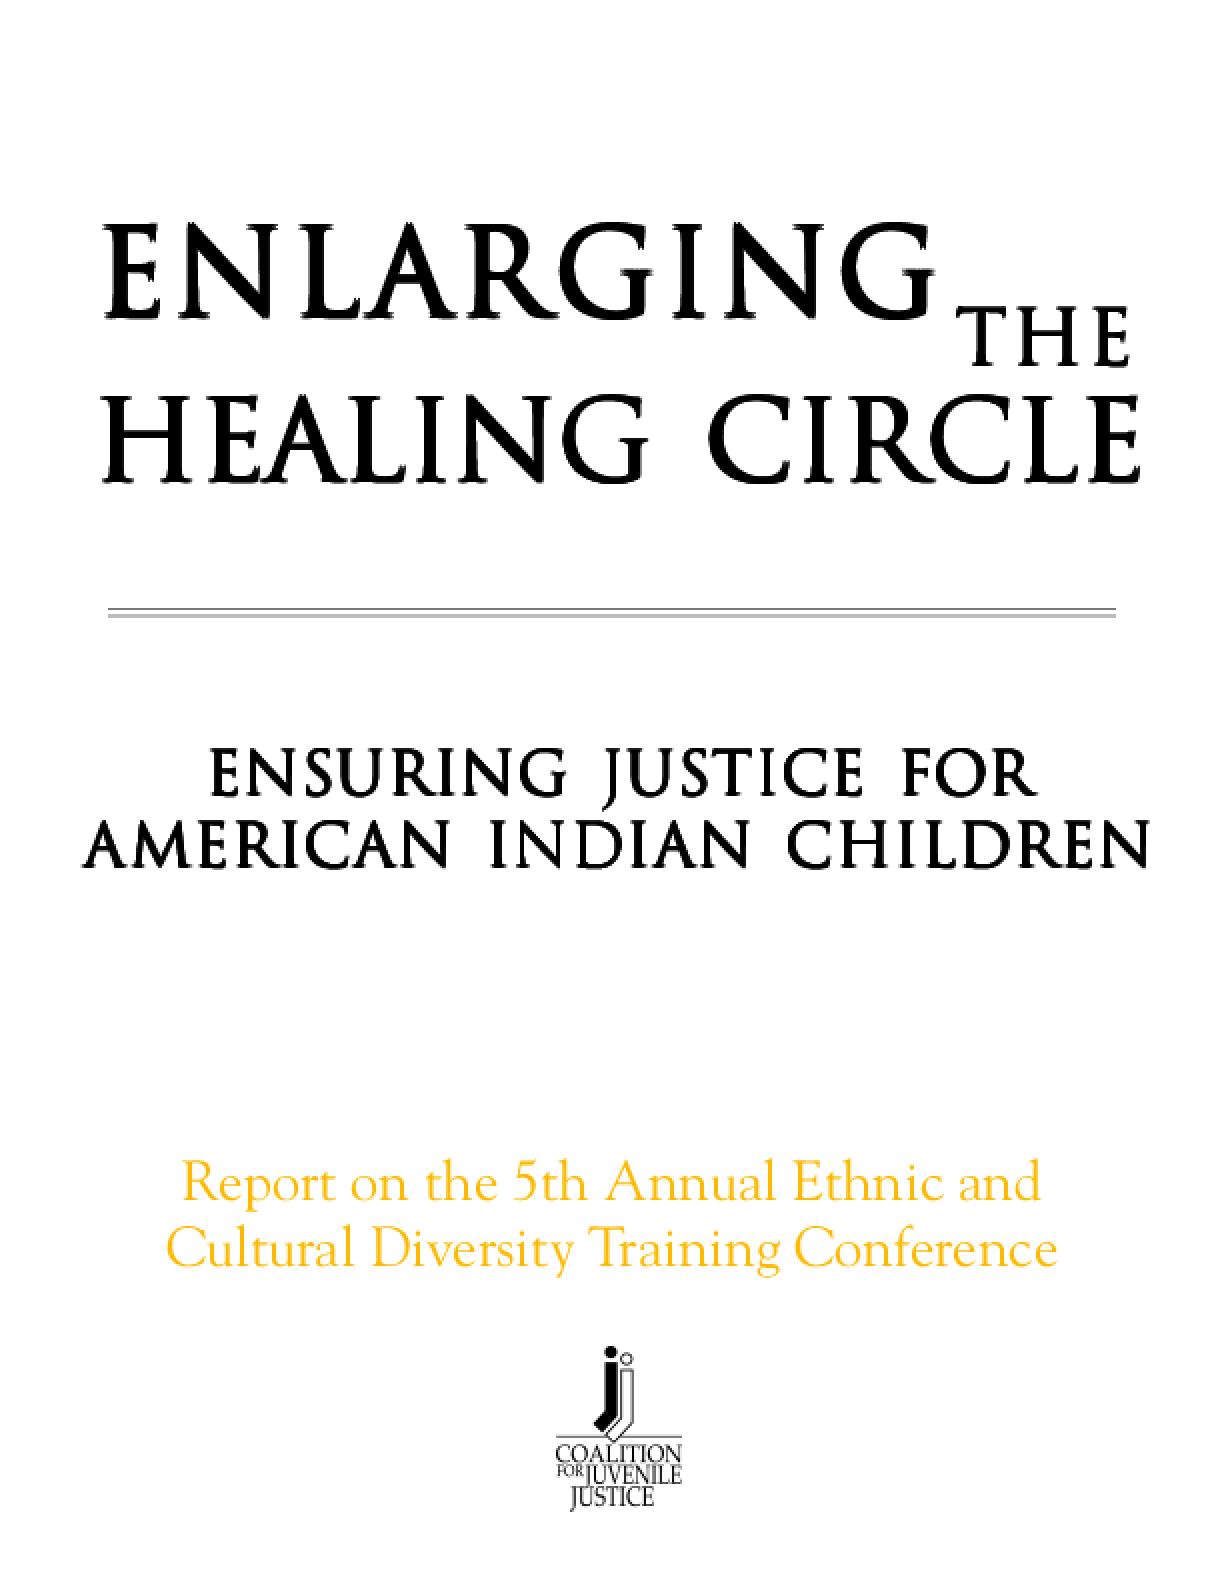 Enlarging the Healing Circle: Ensuring Justice for American Indian Children